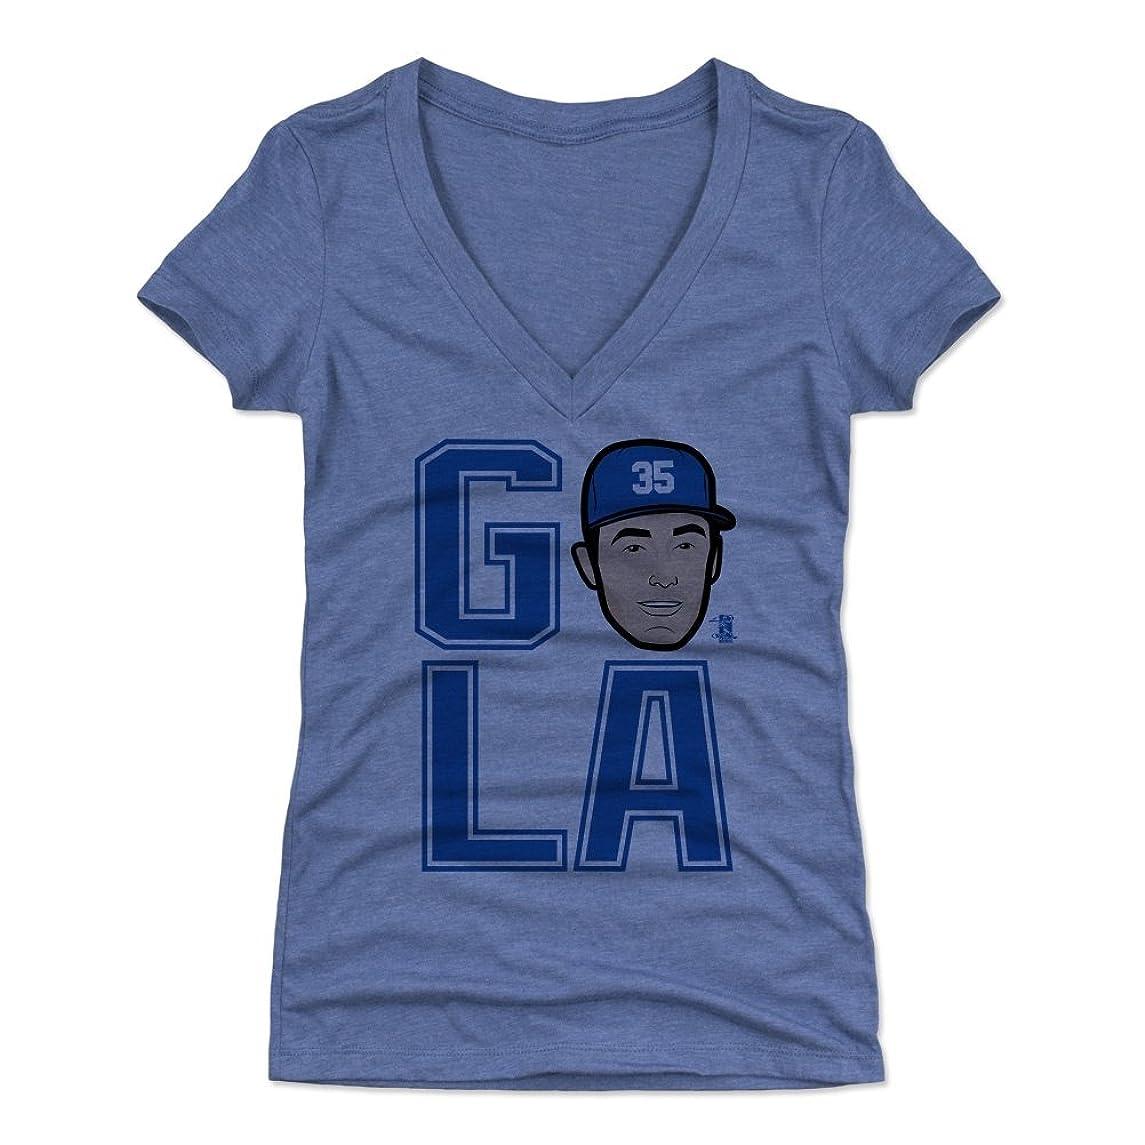 500 LEVEL Cody Bellinger Women's Shirt - Los Angeles Baseball Women's Apparel - Cody Bellinger GO LA